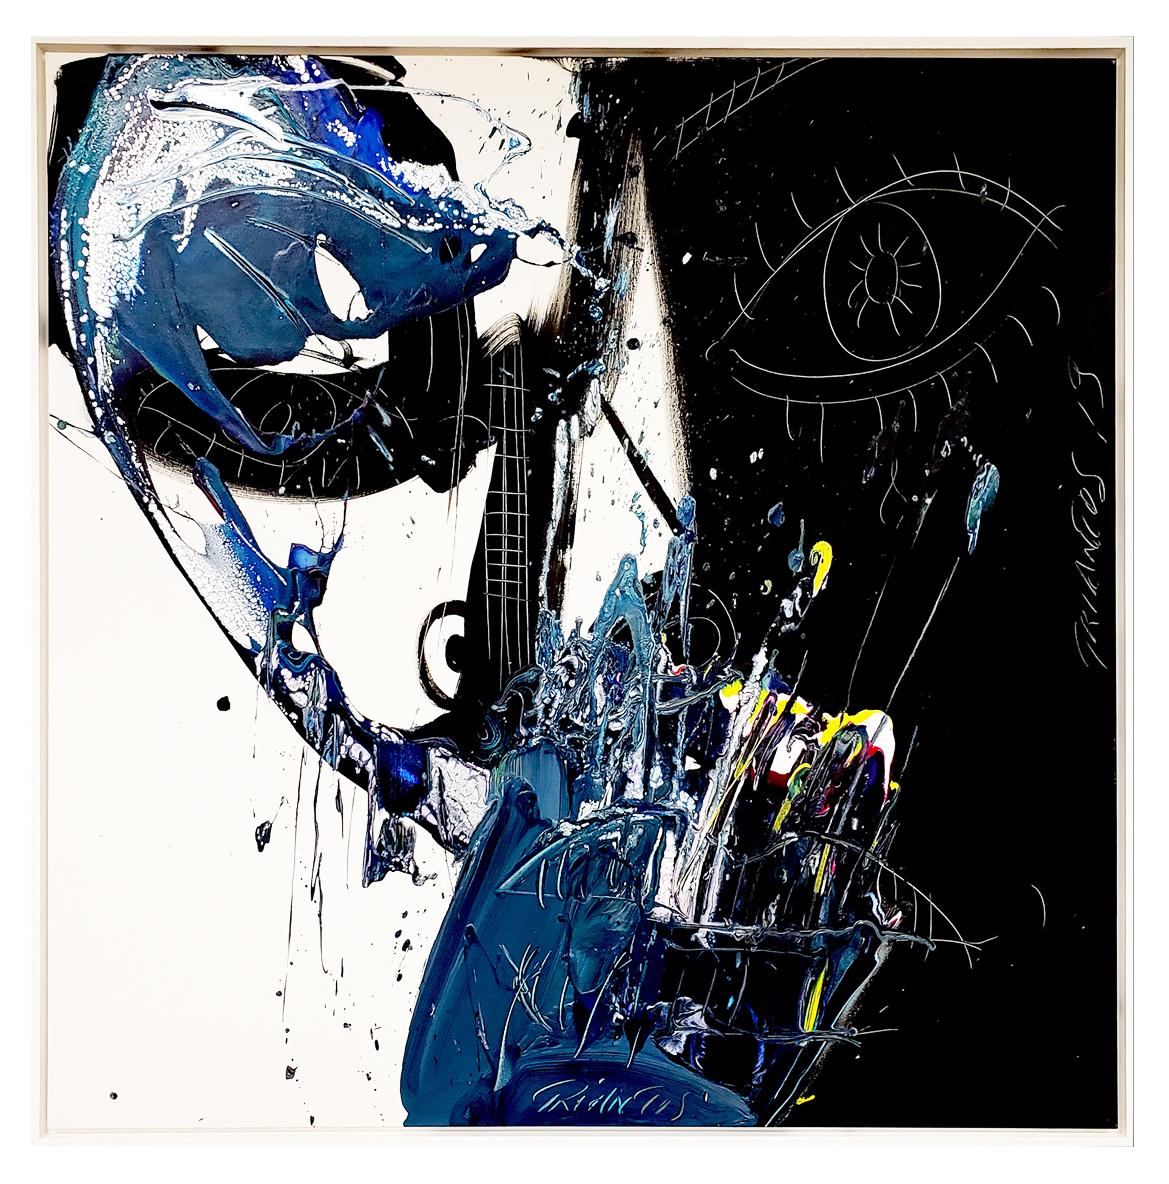 "Untitled #95, 2019, acrylic on canvas, 48"" x 48"" (122 x 122 cm)"